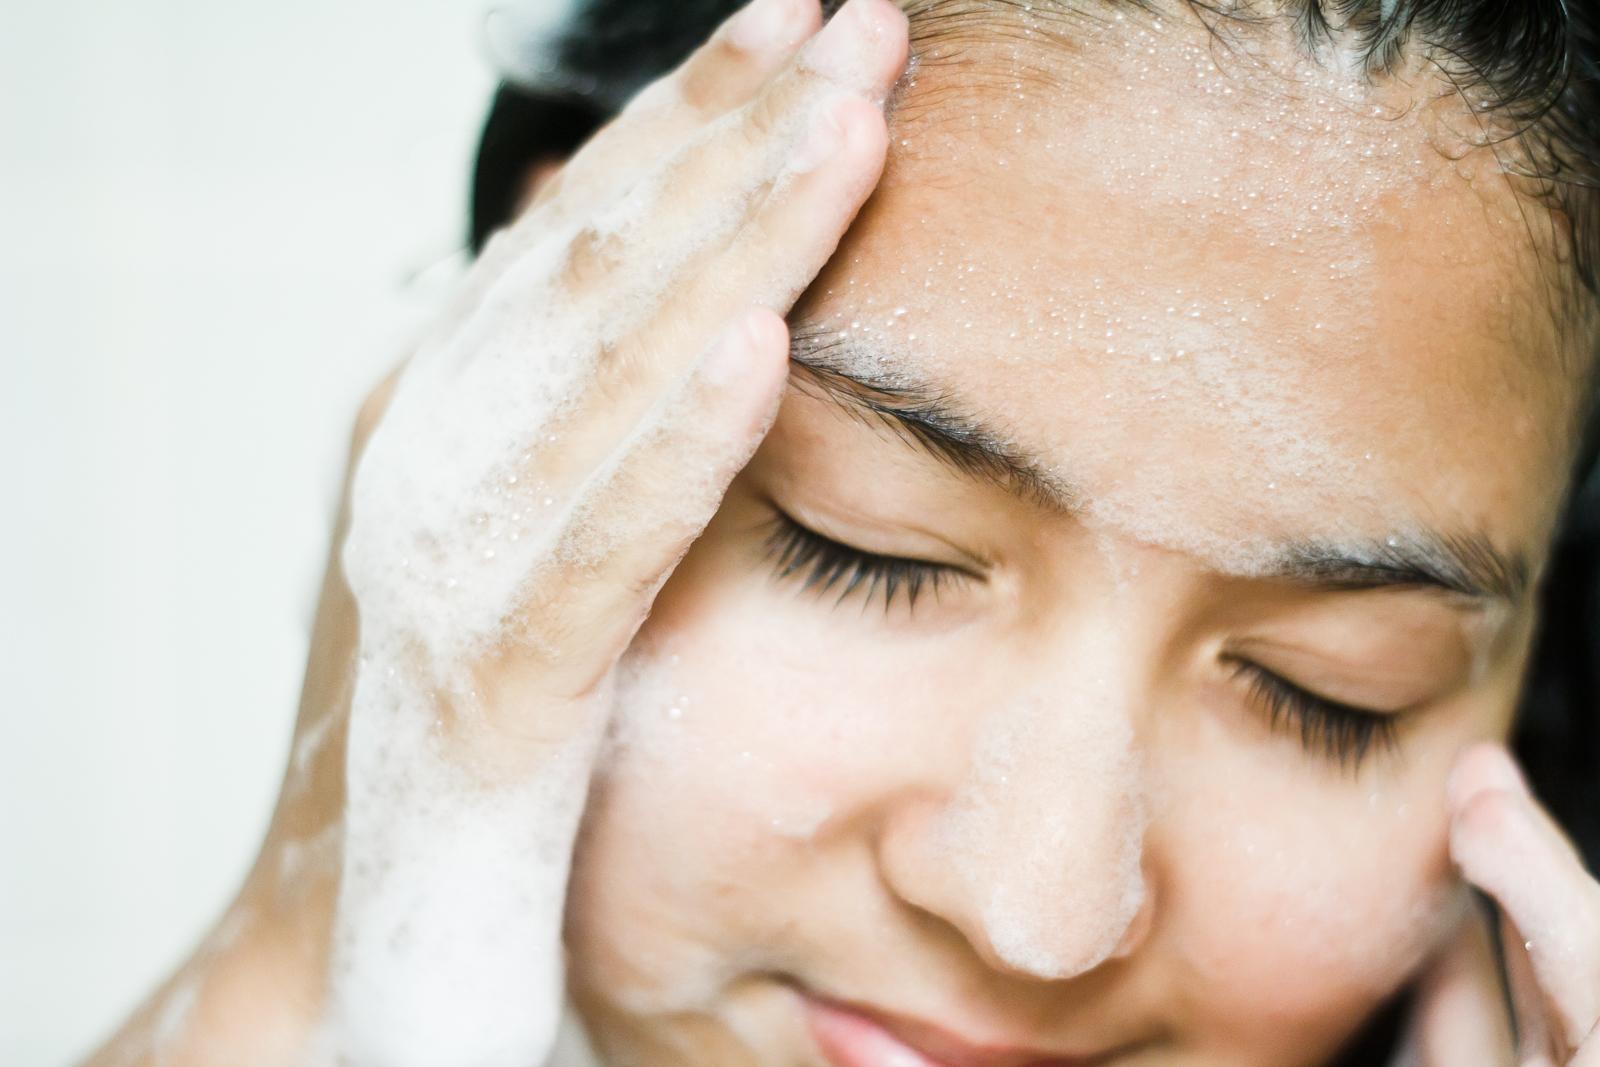 microplastics in scrubs in shampoo